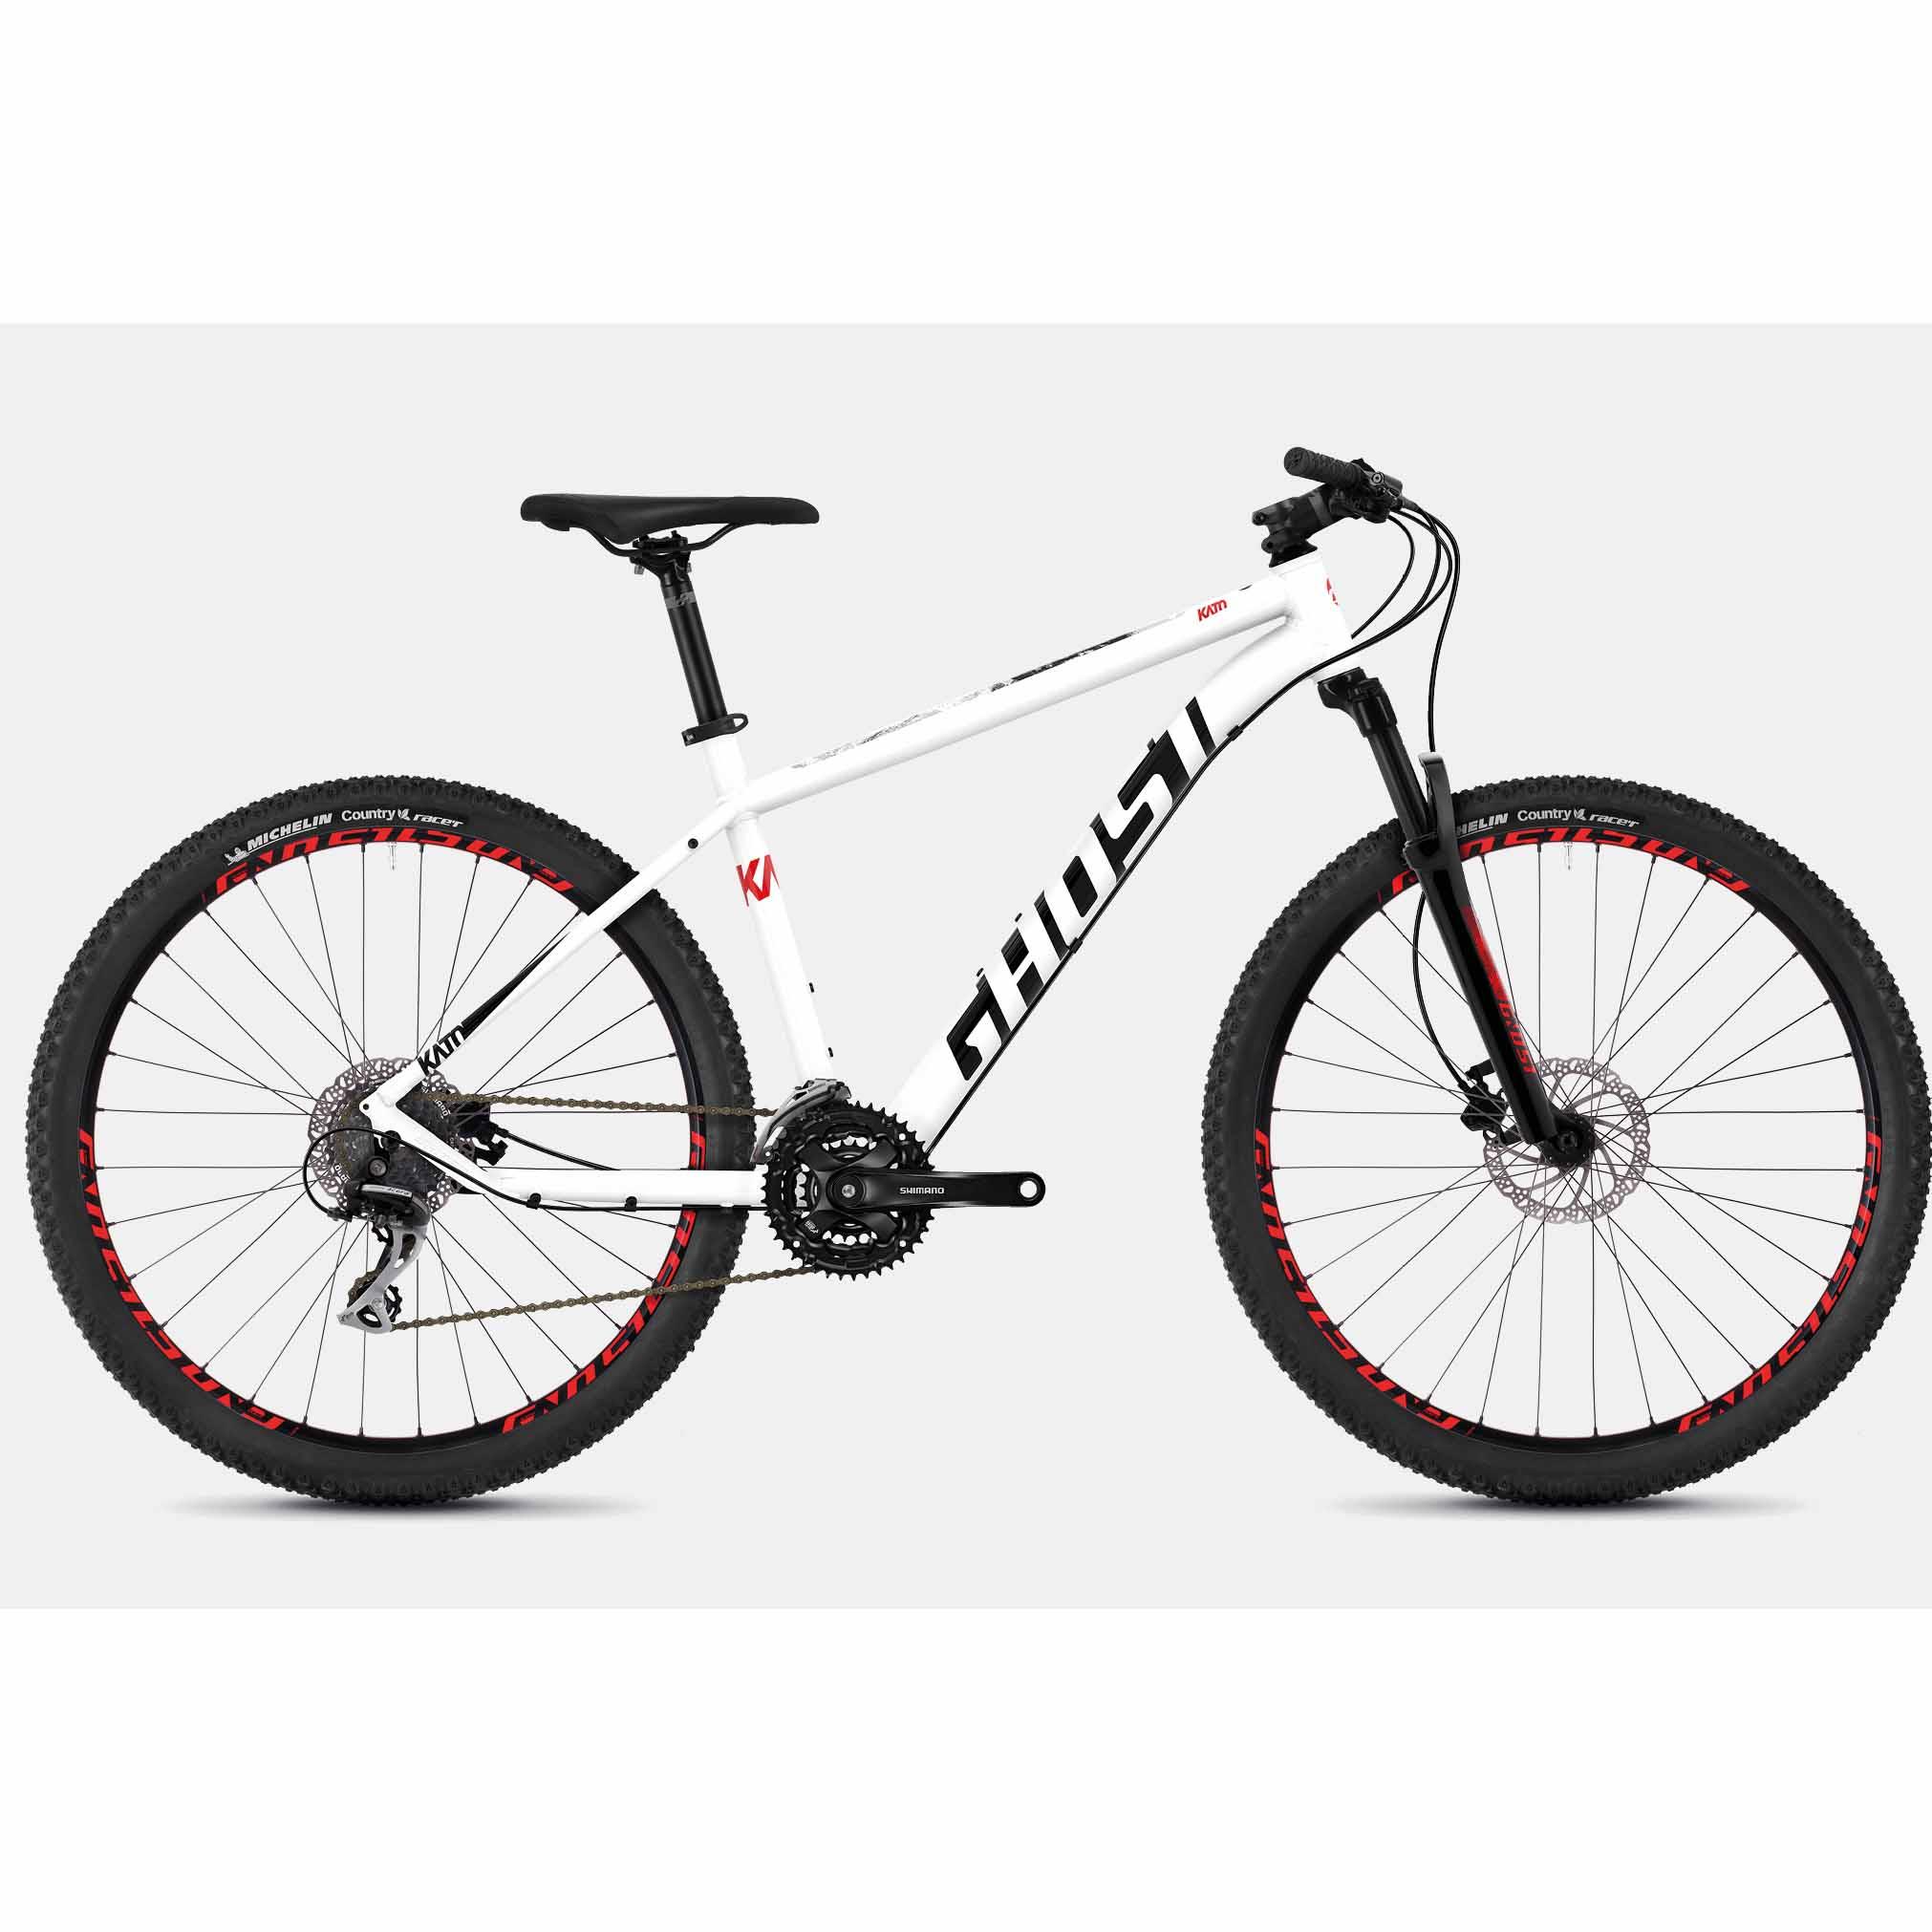 Фото Велосипед Ghost Kato 3.7 27,5″ бело-красно-черный, L, 2019